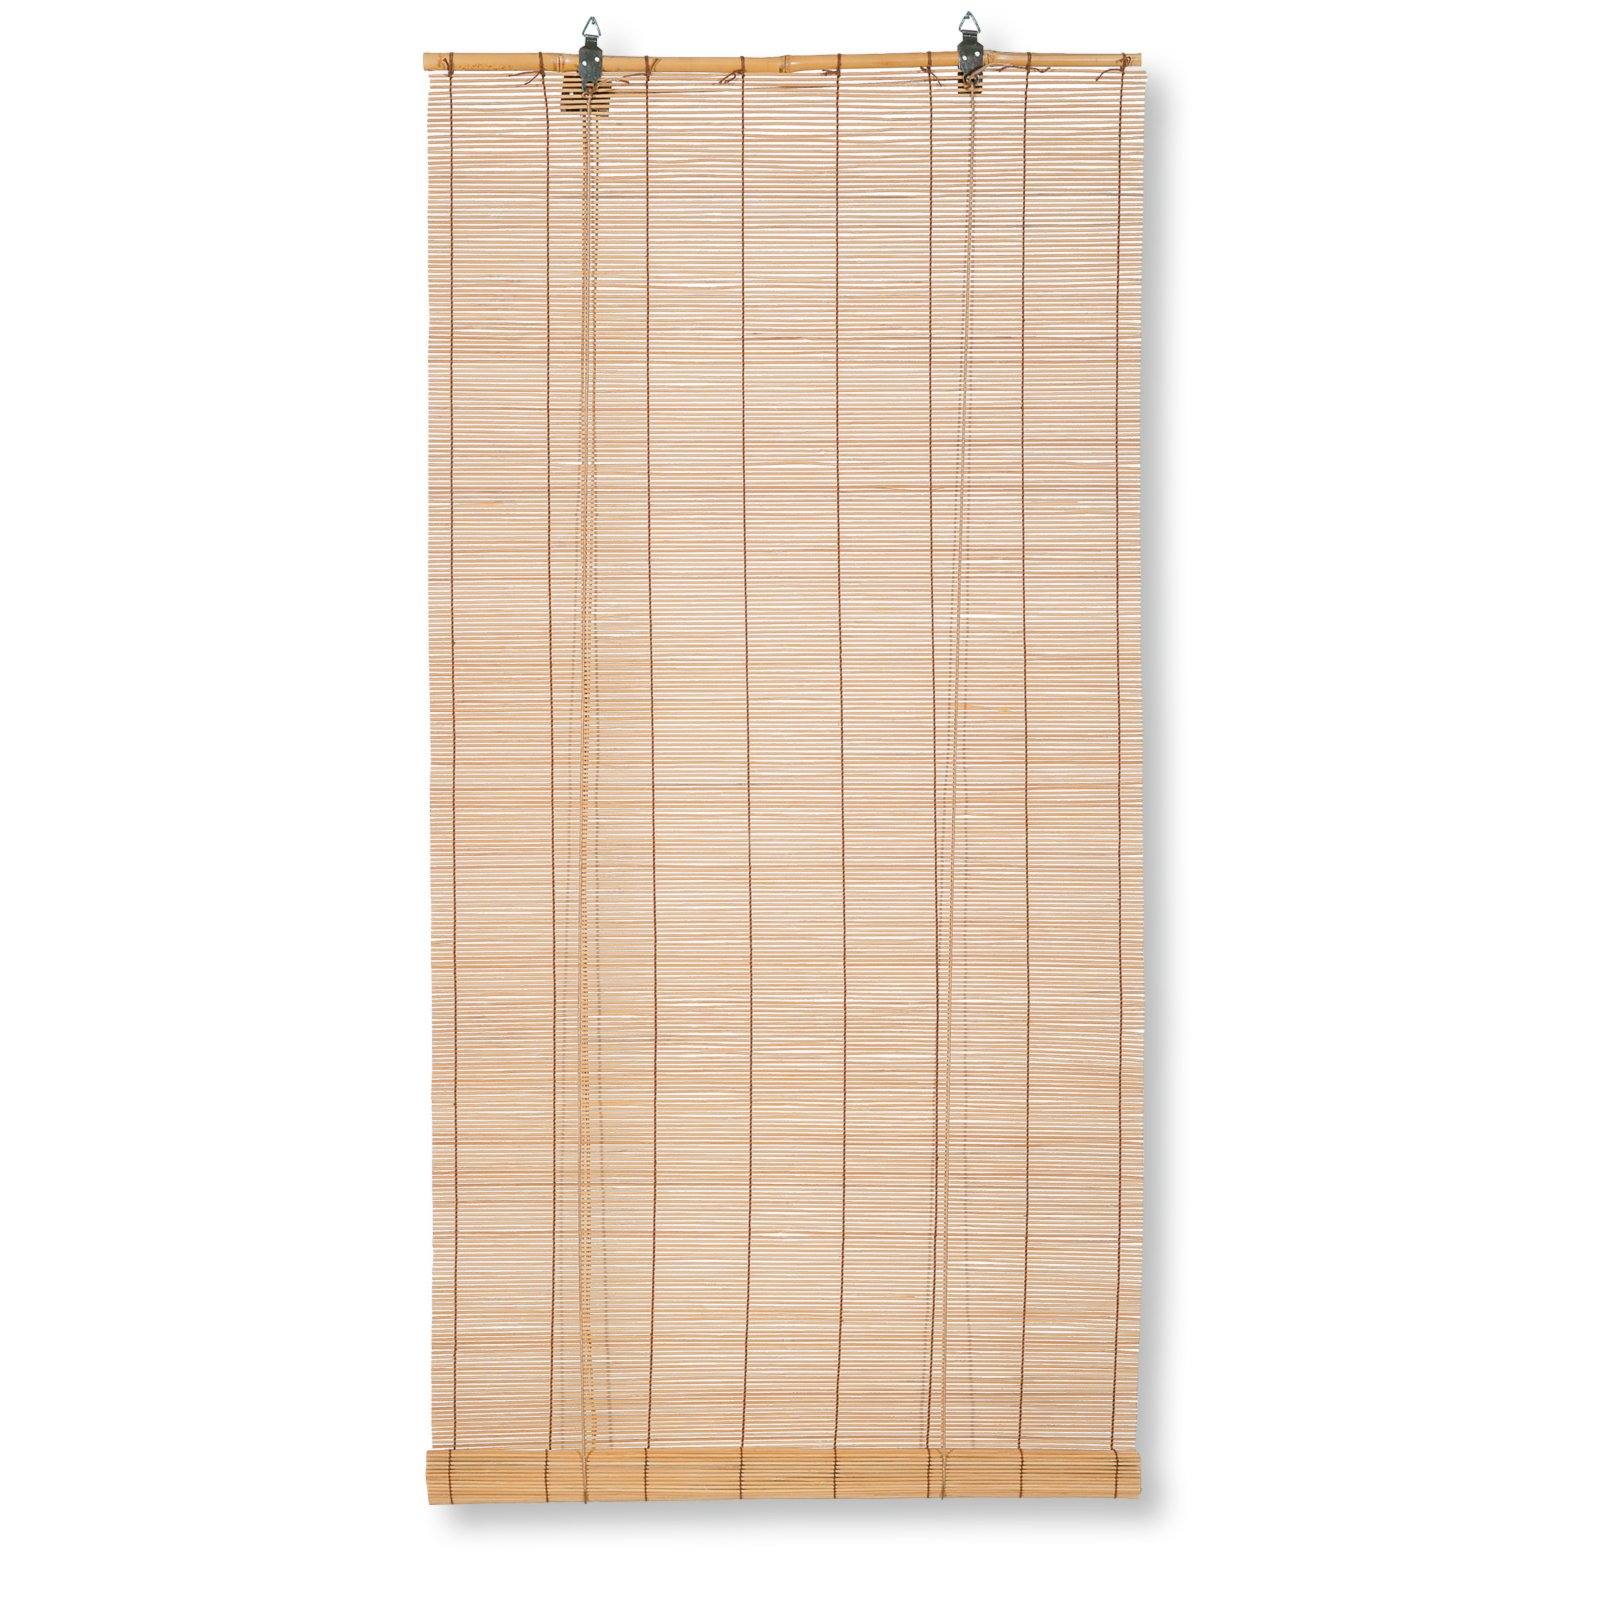 Bambus-Raffrollo - hellbraun - 60x160 cm